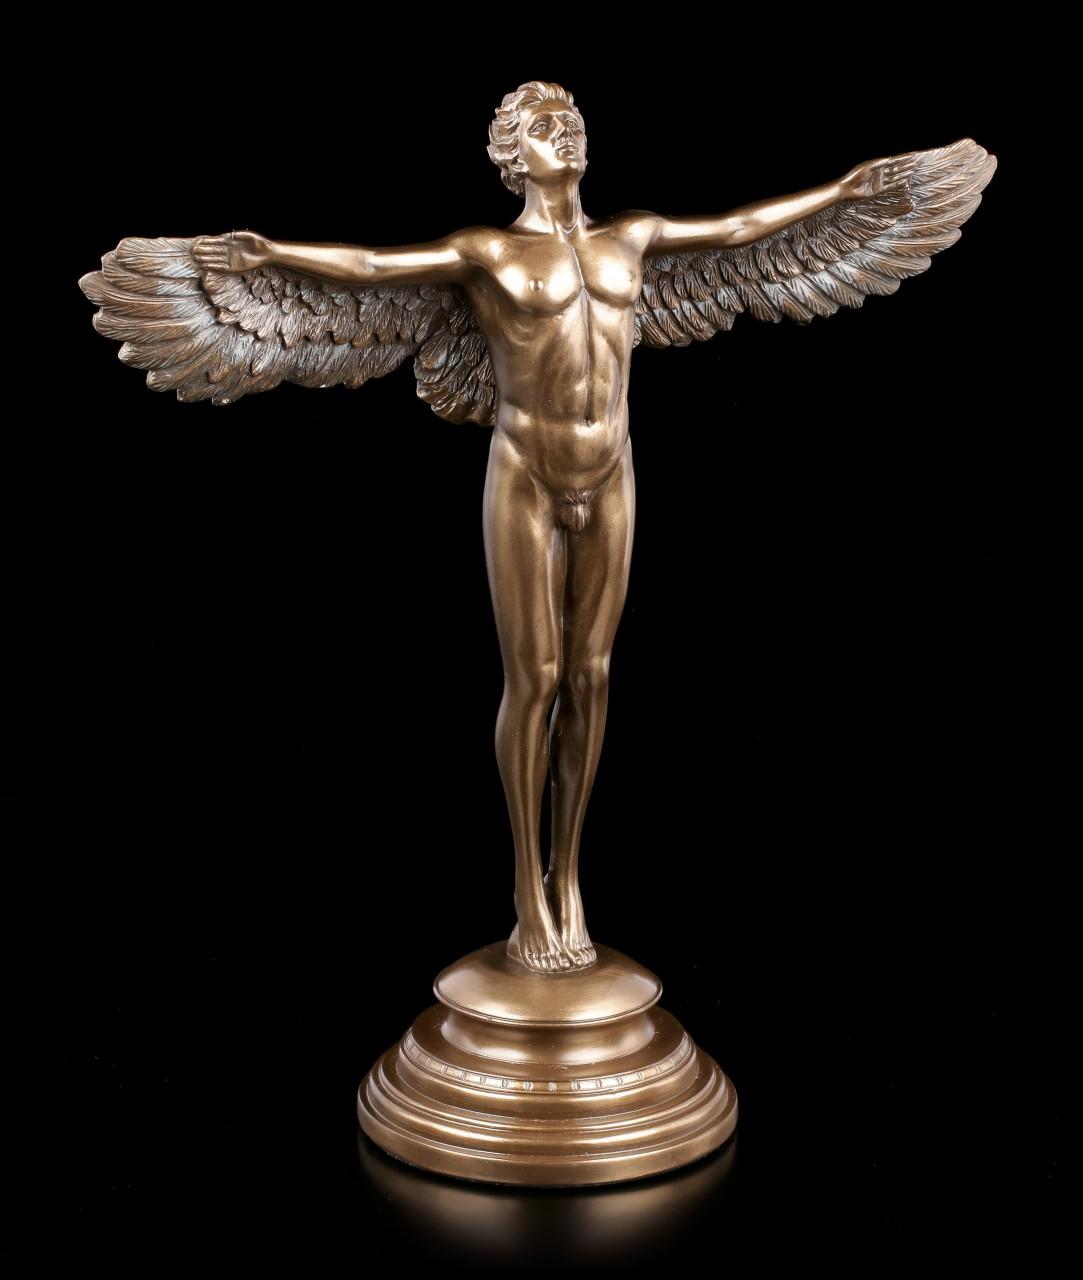 Male Angel Figurine - Rising Day